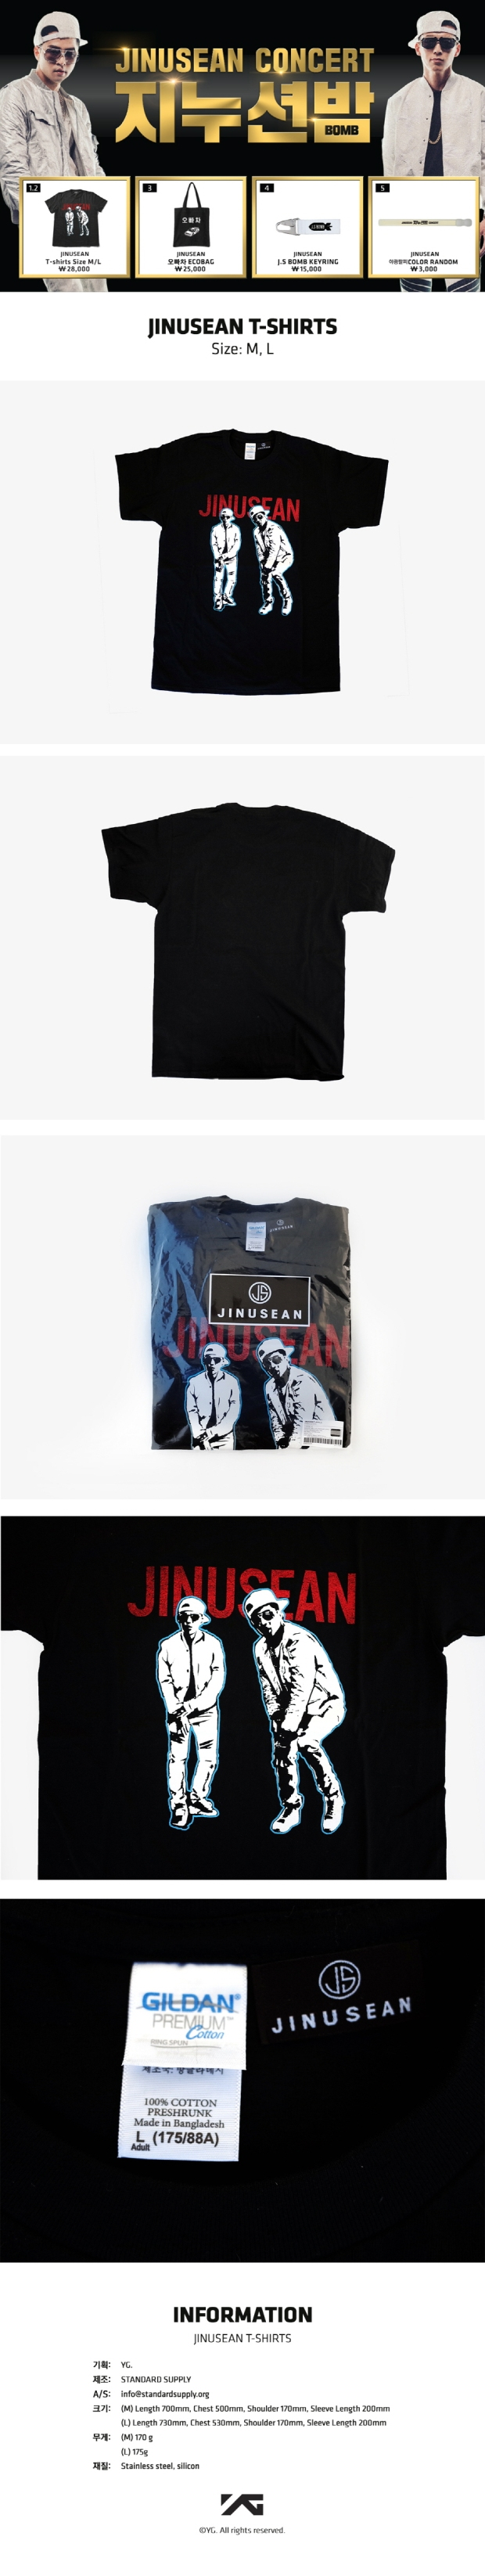 01_jinusean-tshirts_01